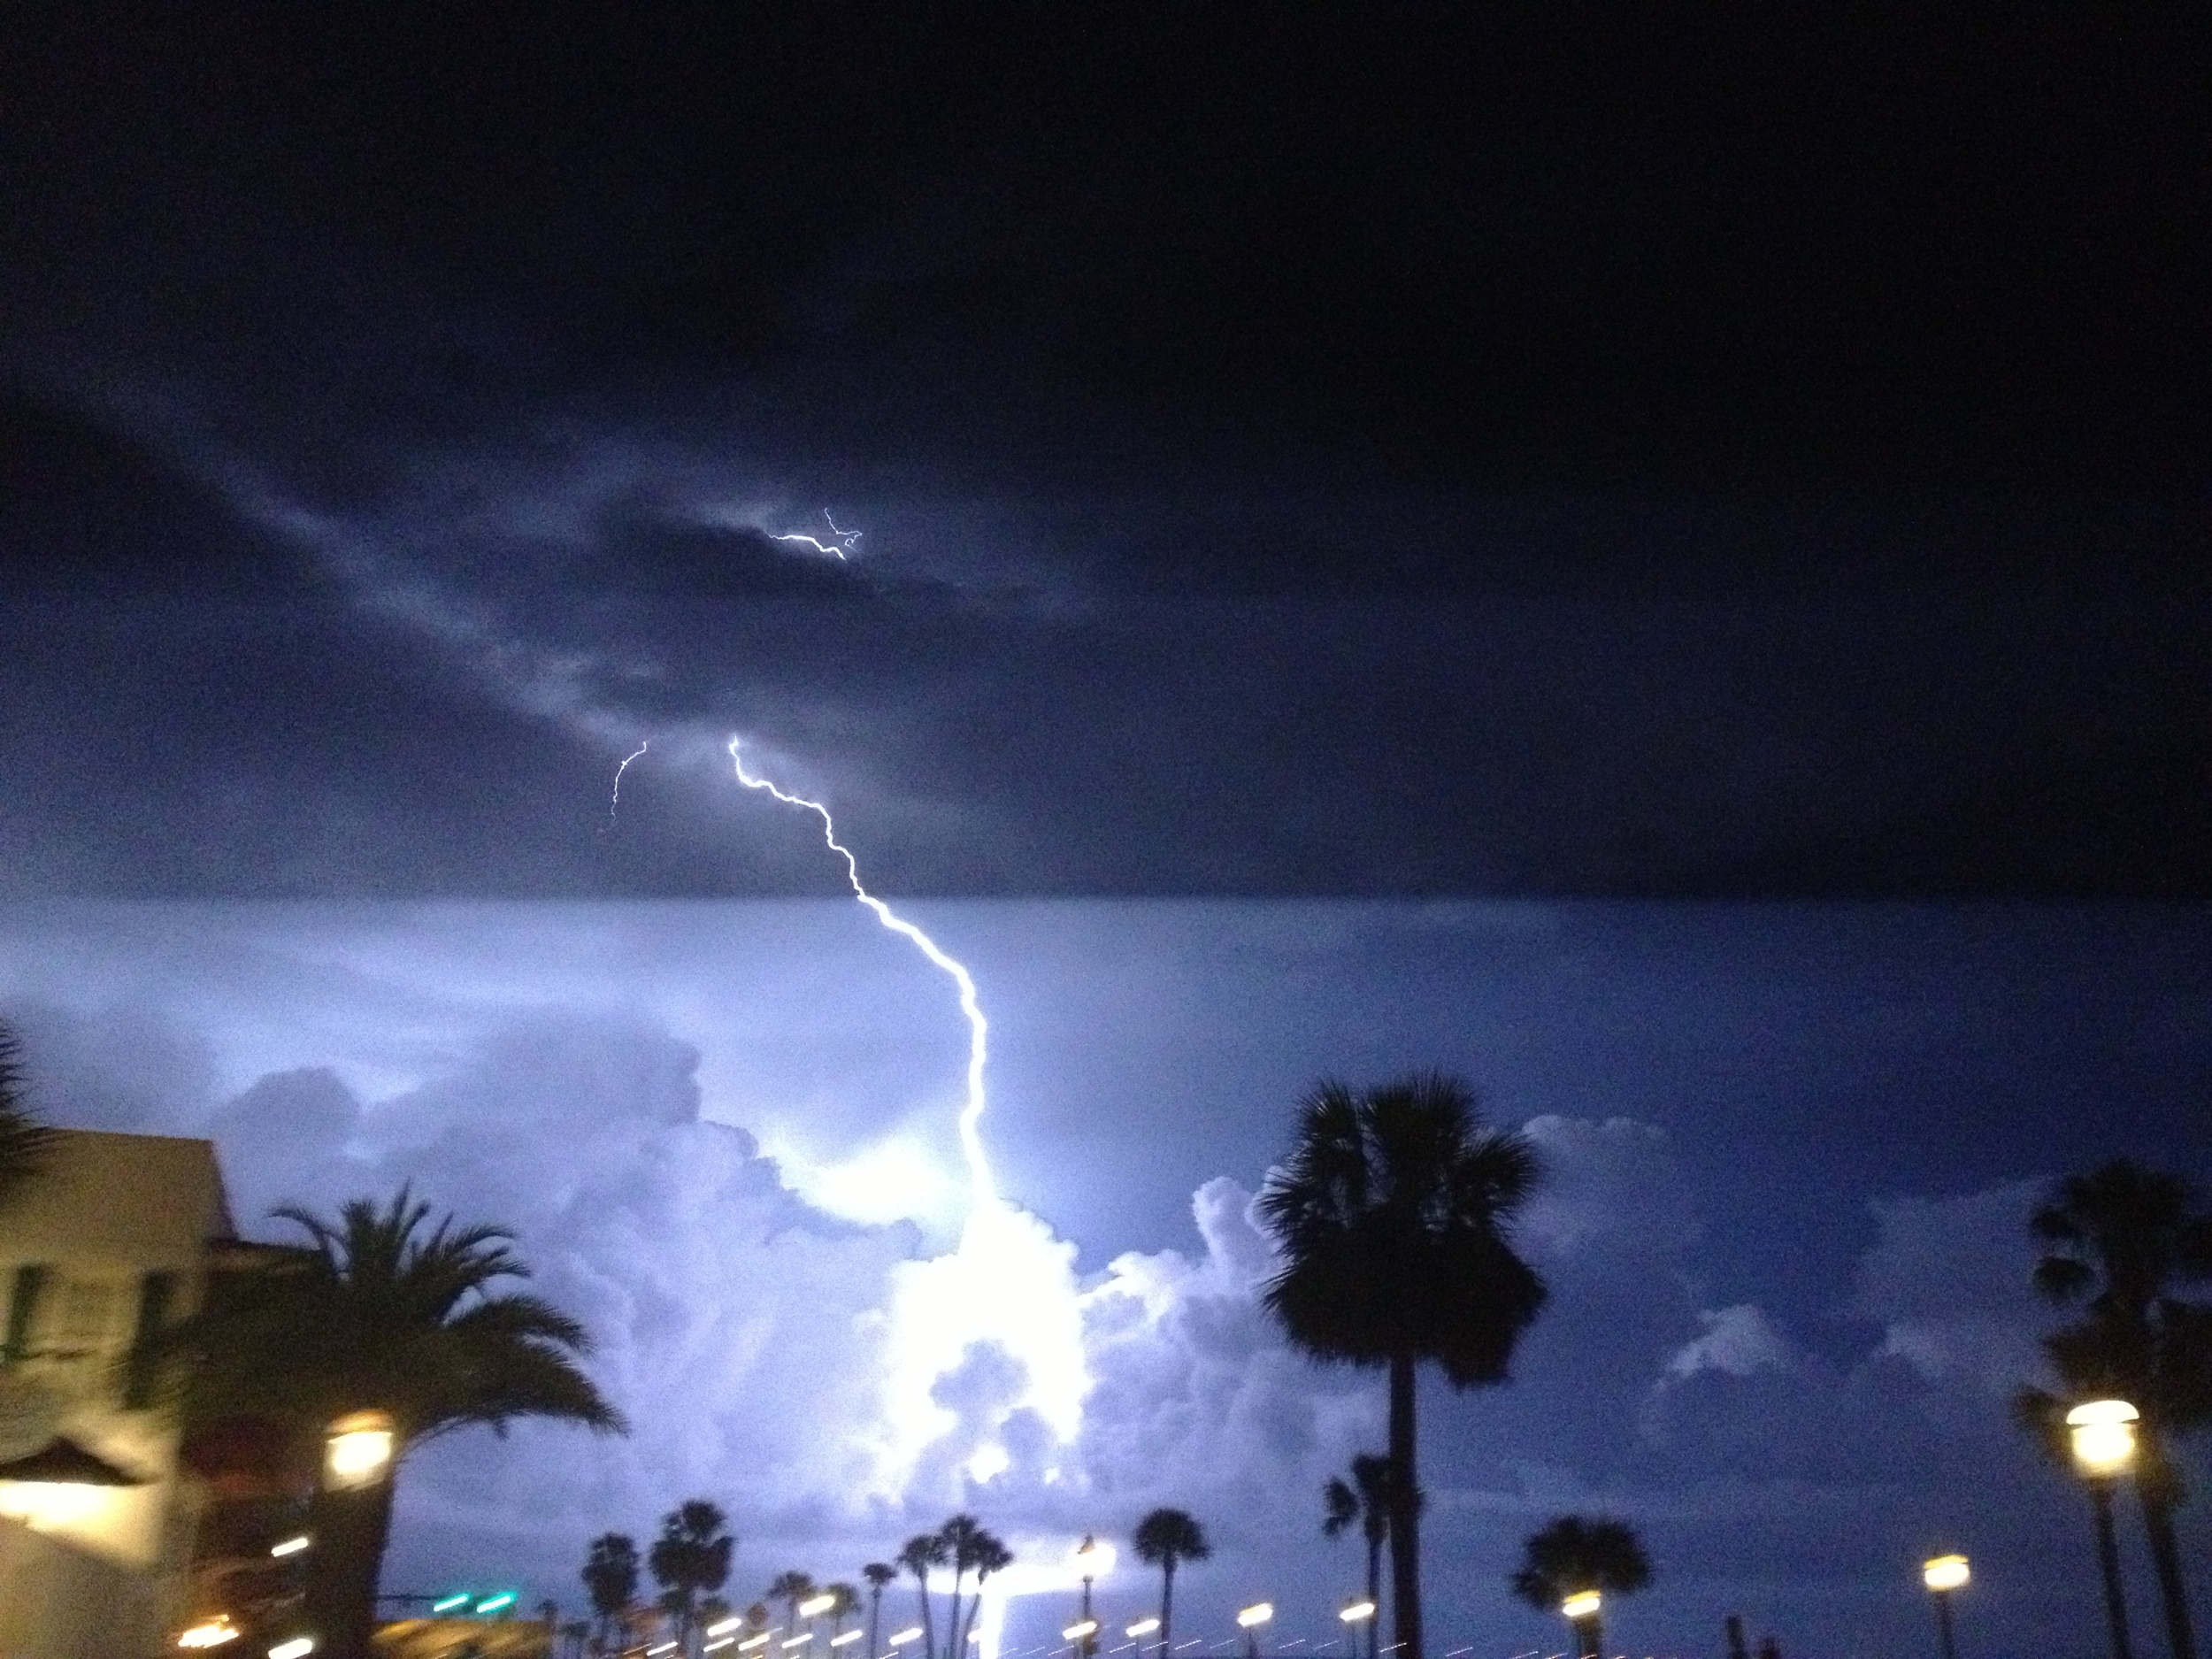 St. Augustine Lightening Storm through an iphone, 10-4-12